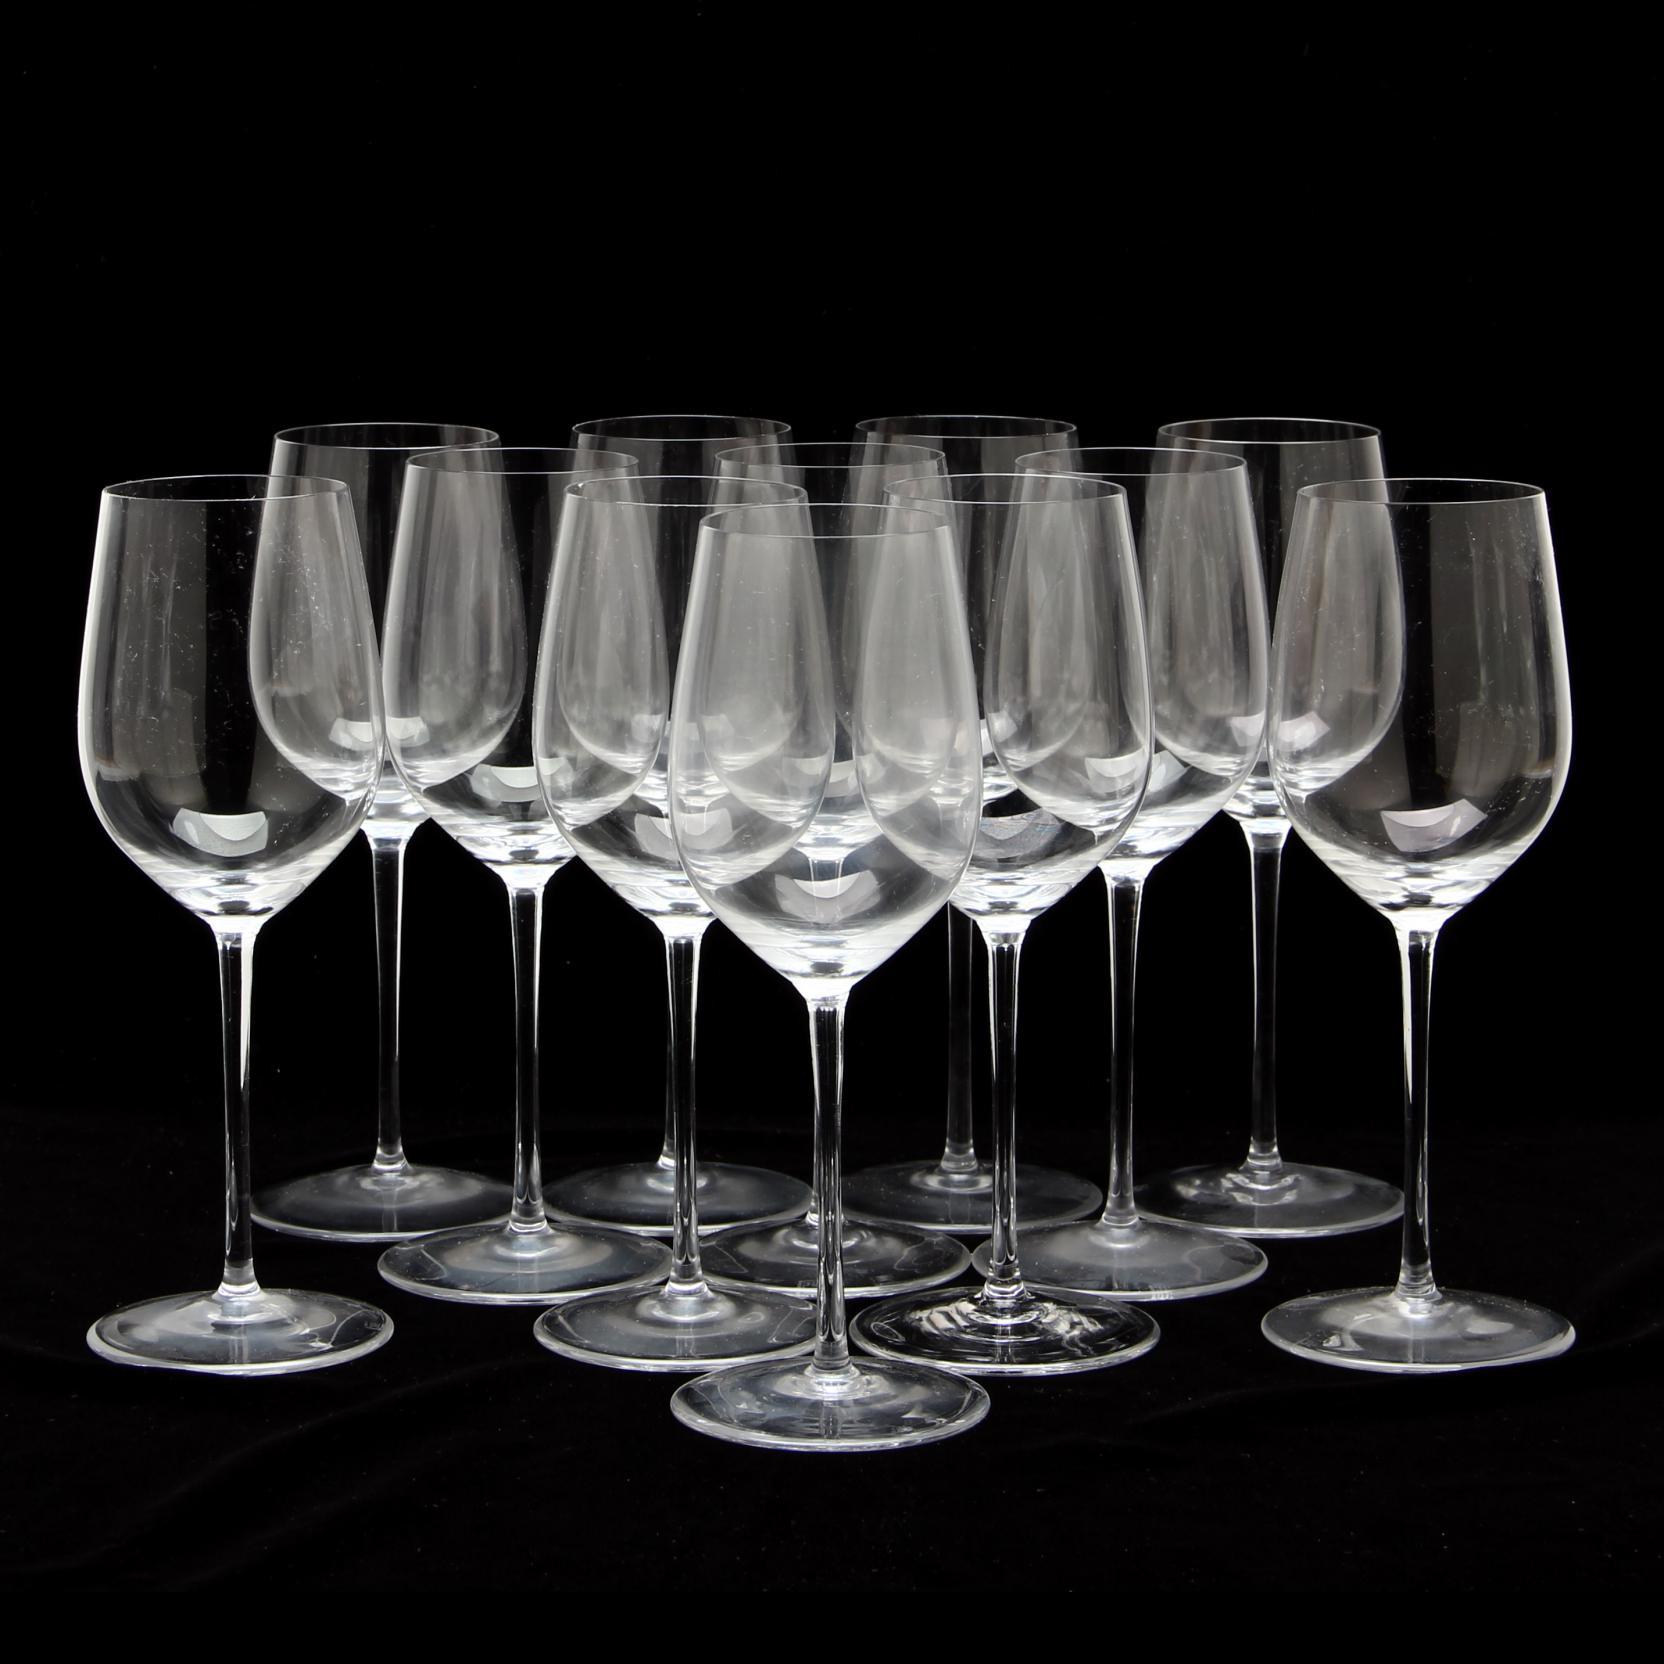 set-of-twelve-riedel-veritas-chardonnay-wine-glasses